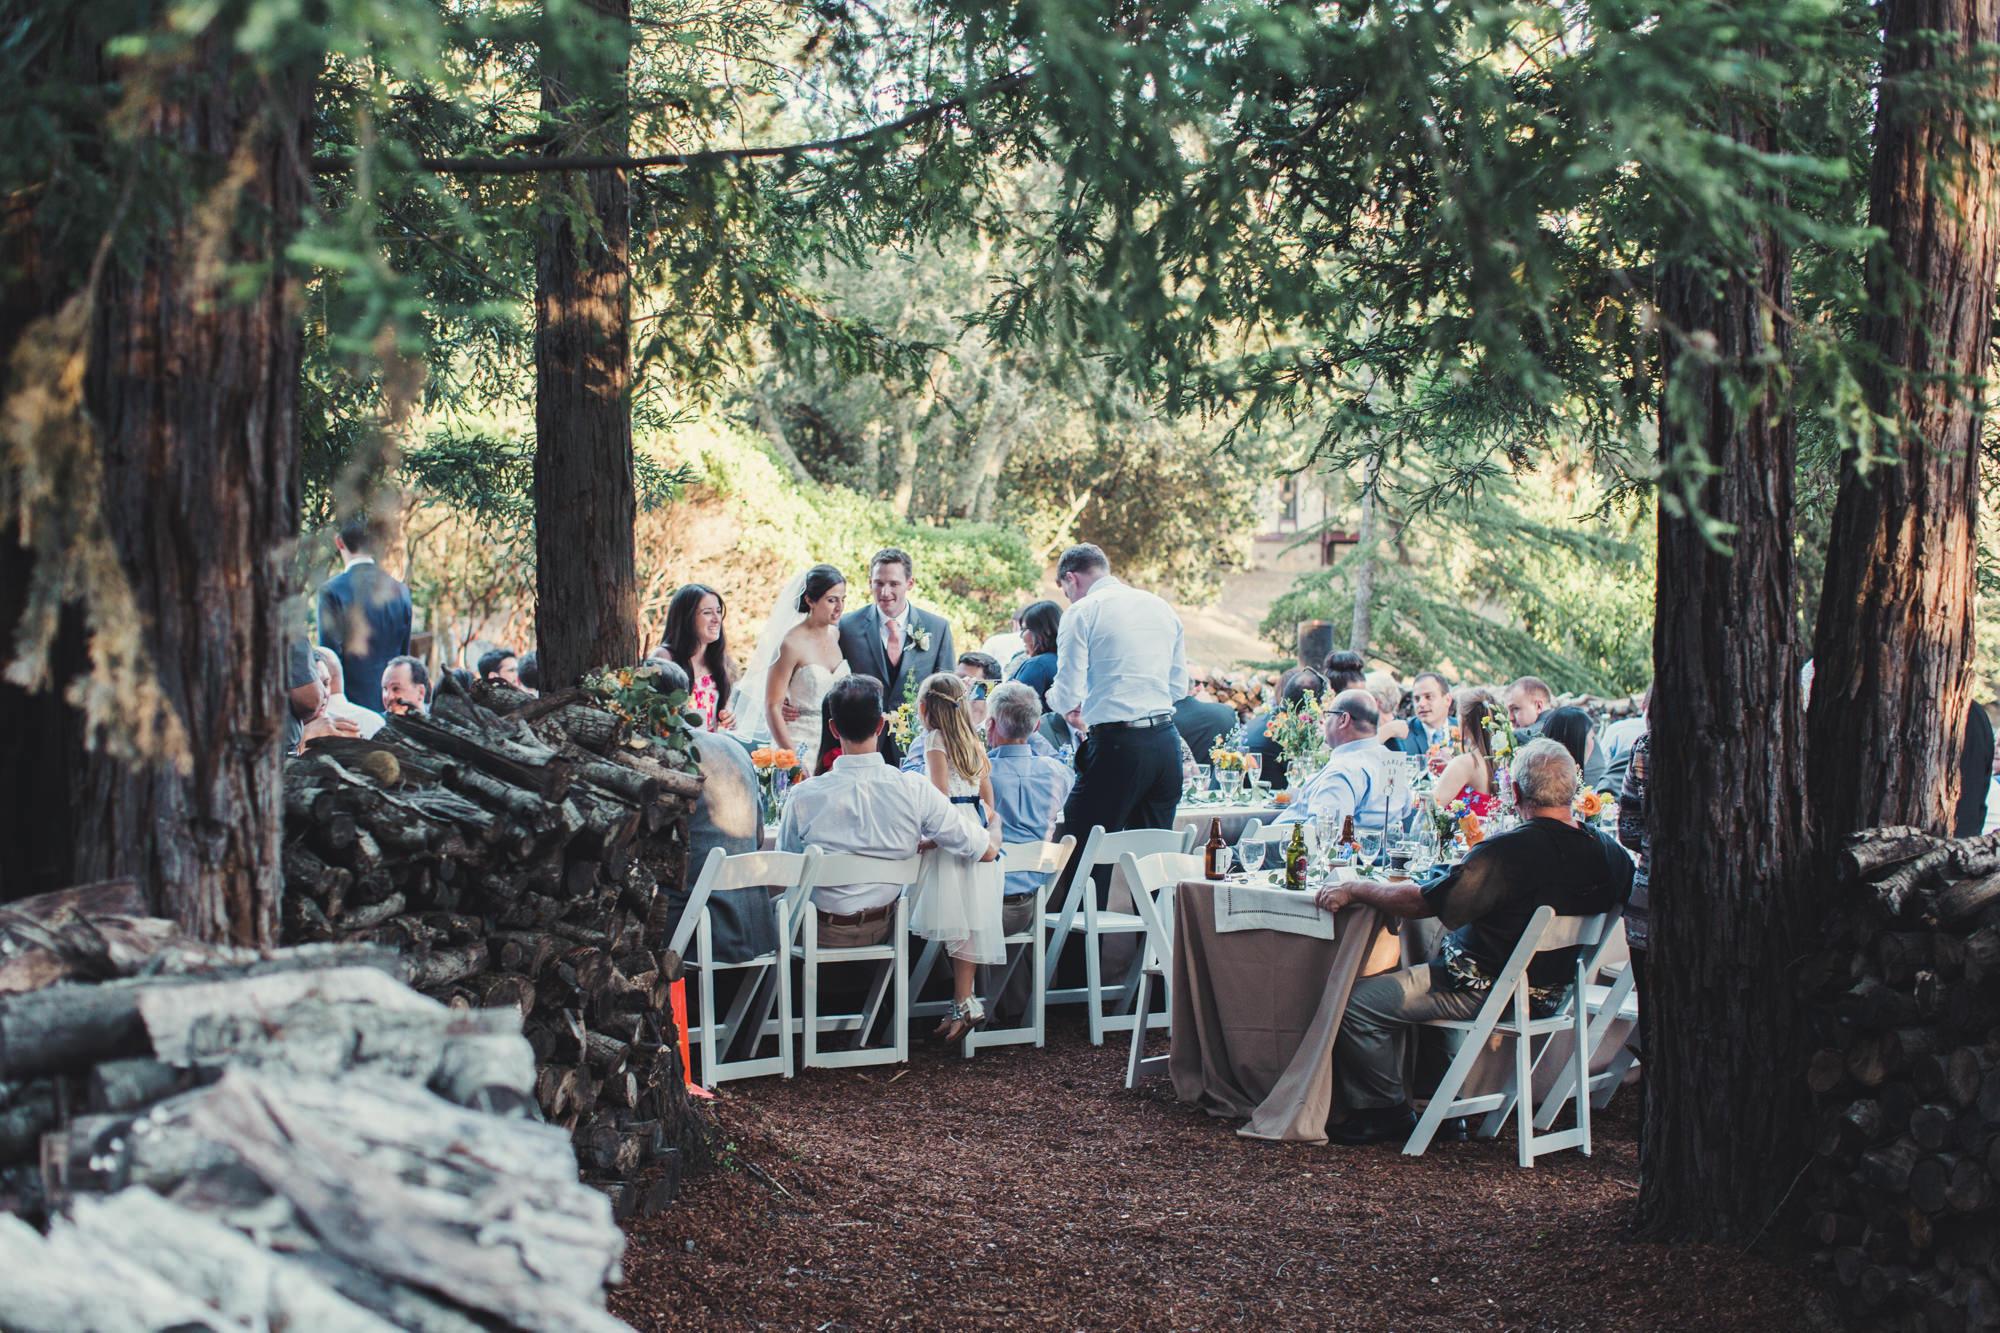 Backyard Wedding in California©Anne-Claire Brun 0031